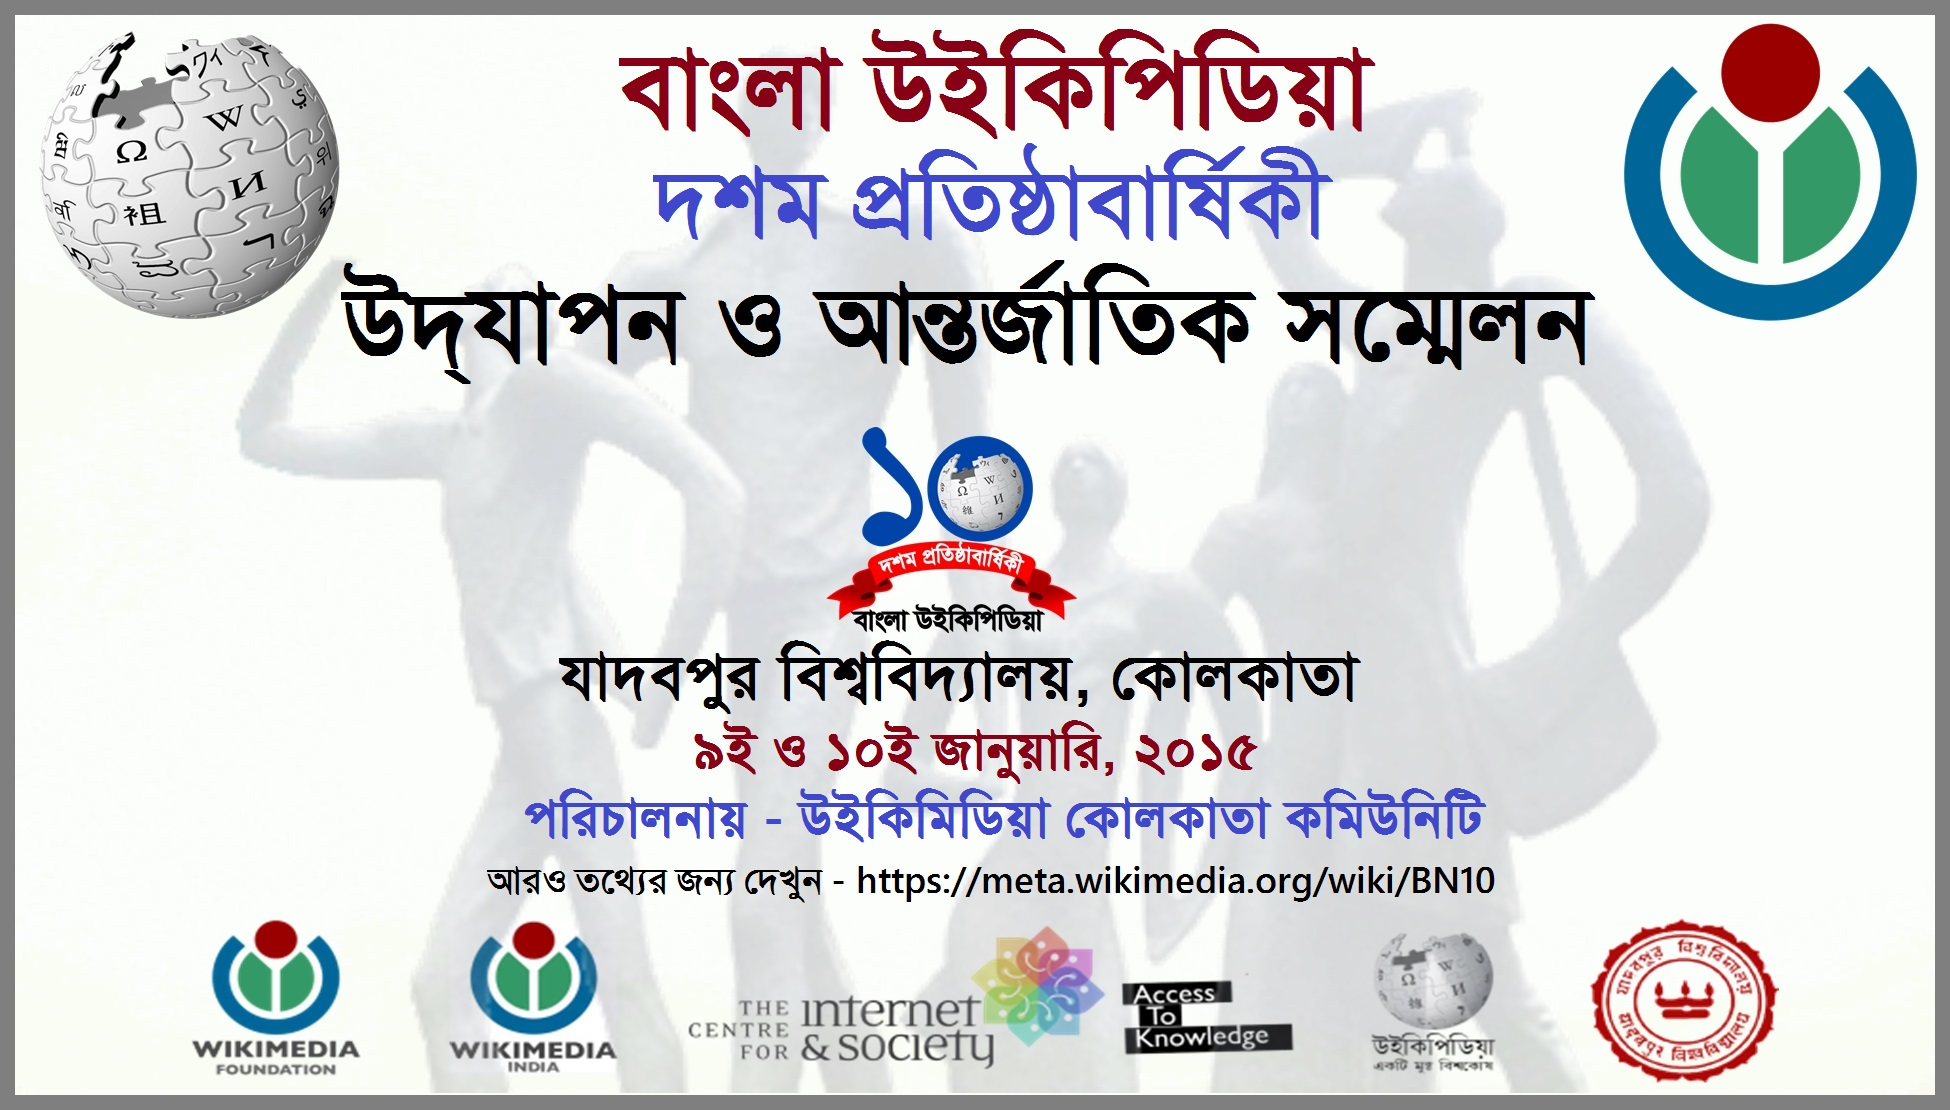 Filebengali wikipedia 10th anniversary celebration 2015 filebengali wikipedia 10th anniversary celebration 2015 invitation card in bengalig stopboris Choice Image